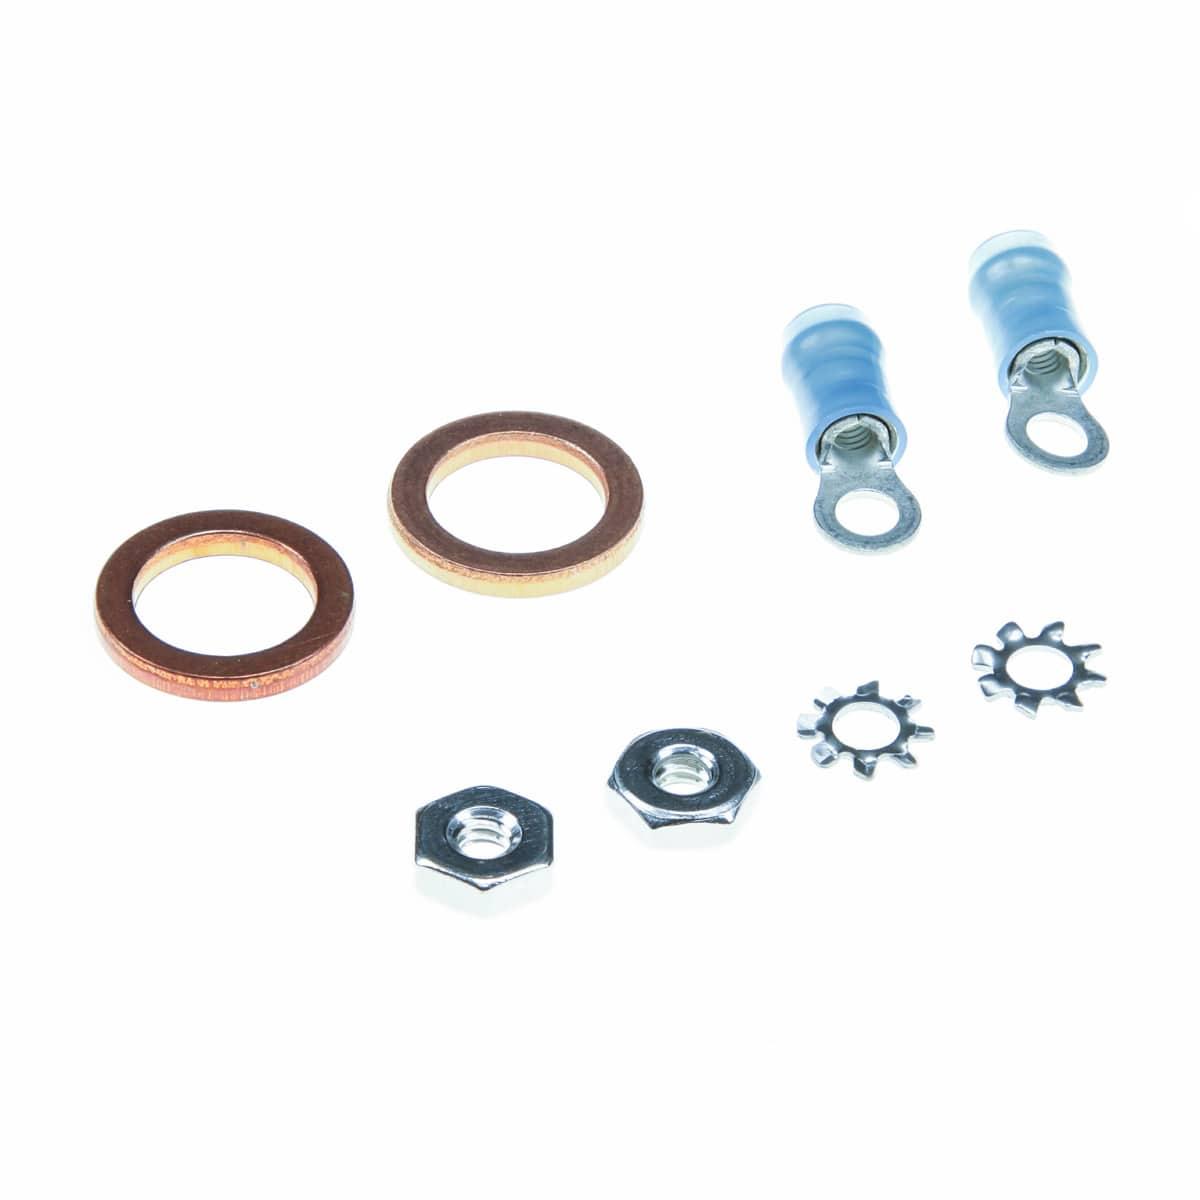 Walbro Fuel Pump Hardware Kit 400-929